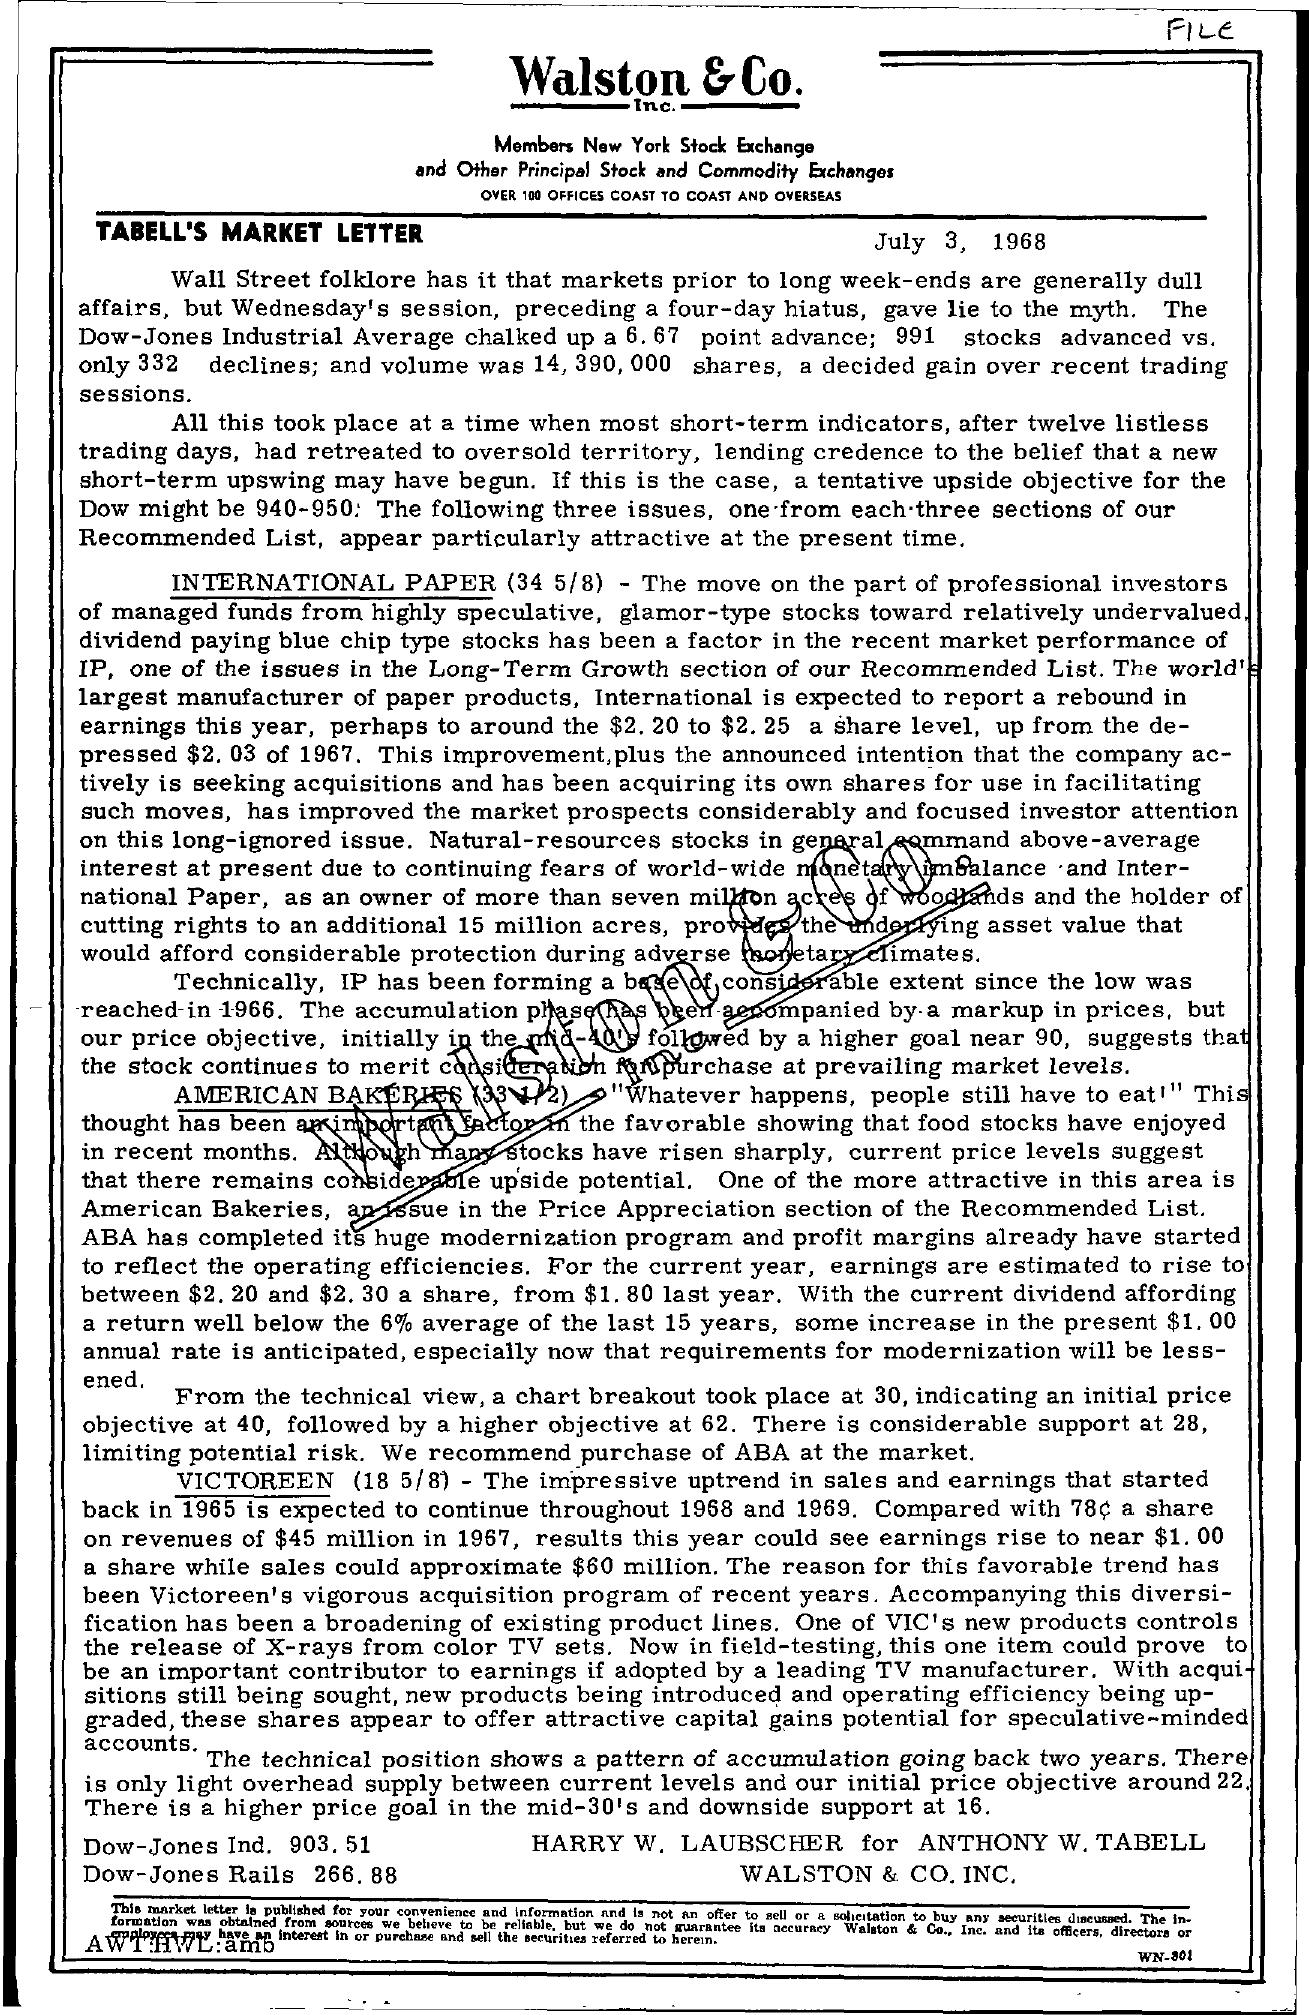 Tabell's Market Letter - July 03, 1968